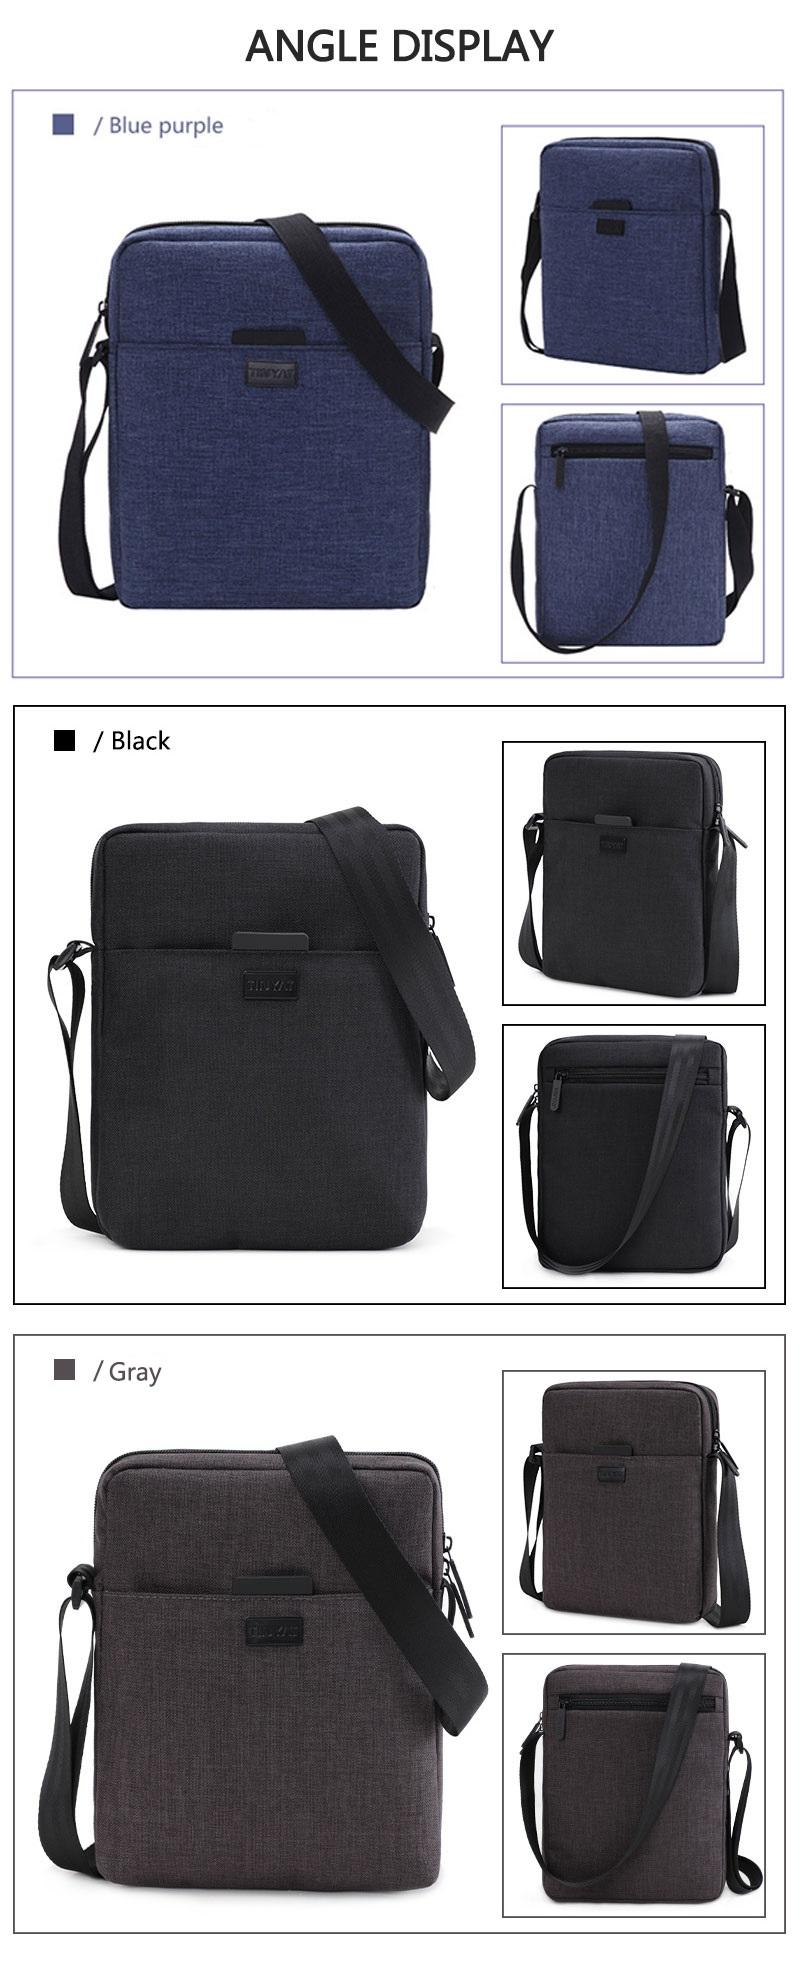 TINYAT Light Canvas Men's Shoulder Bag For 7.9' Ipad Casual Crossbody Bag Waterproof Business Shoulder bag for men 0.13kg 10